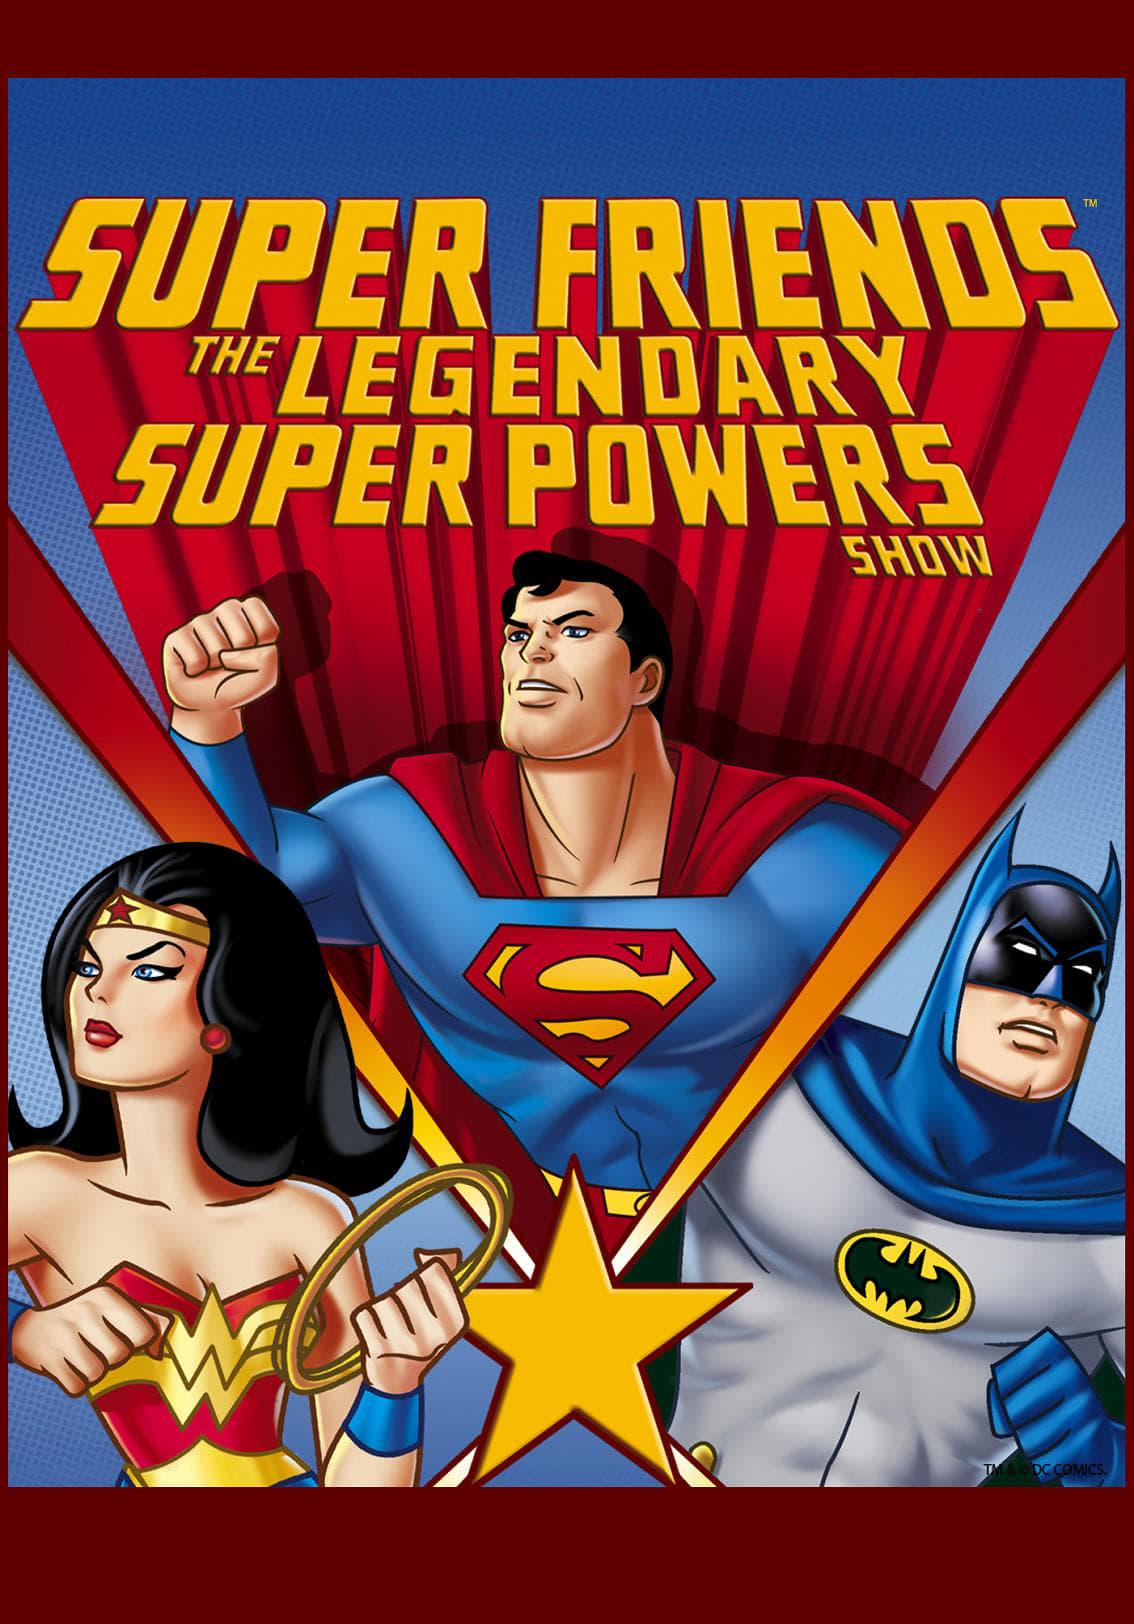 Super Friends: The Legendary Super Powers Show